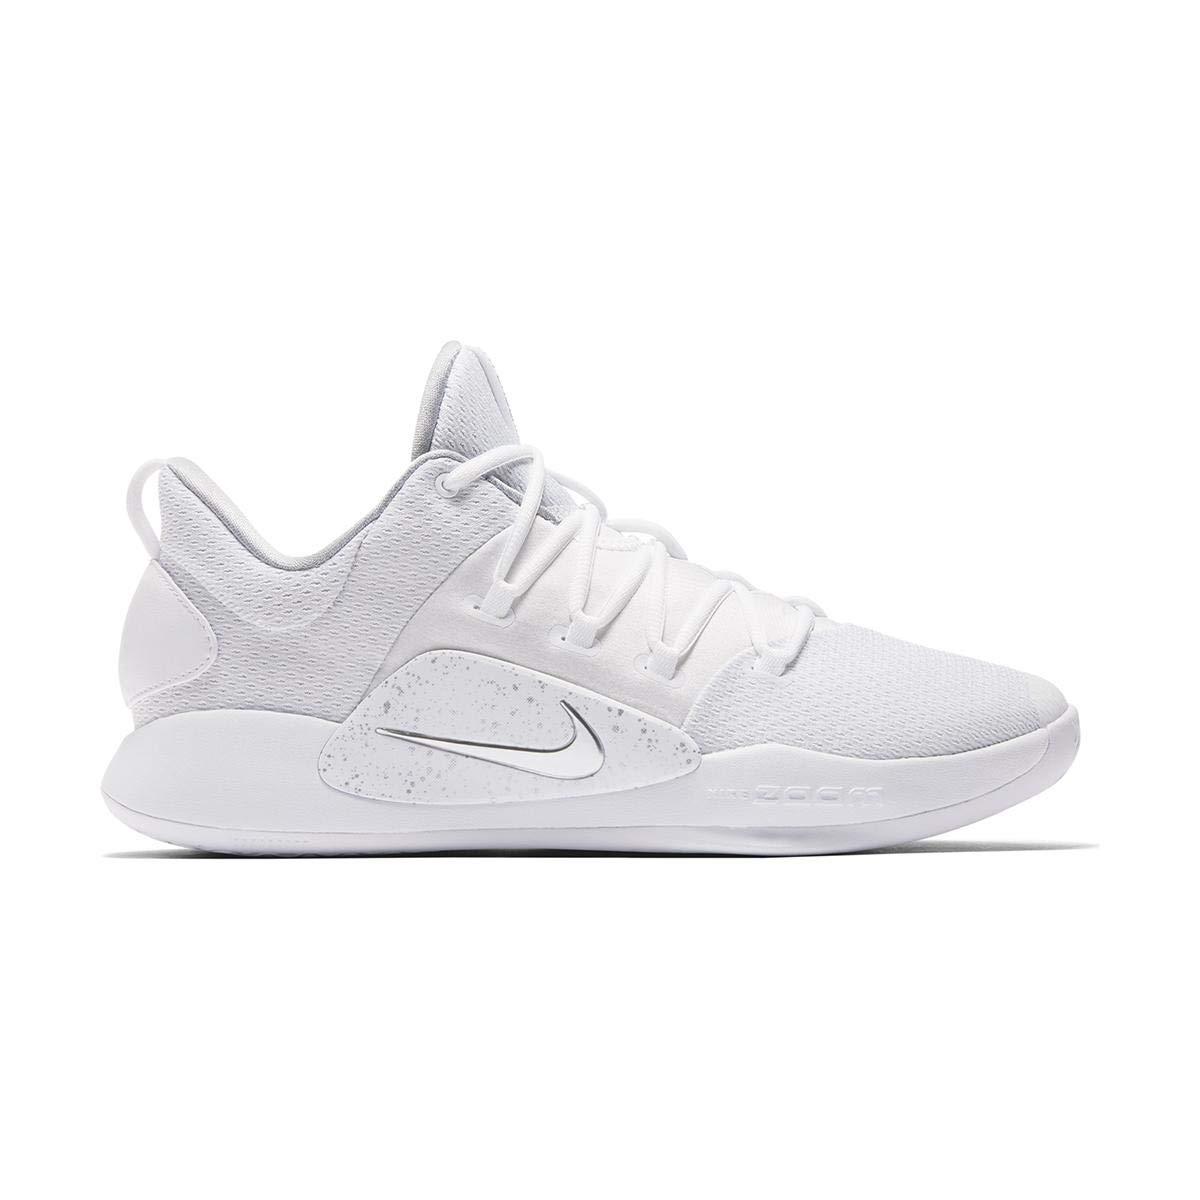 98949b1b1170 Nike Men s Hyperdunk X Low Basketball Shoe AR0464-100 8 D(M)